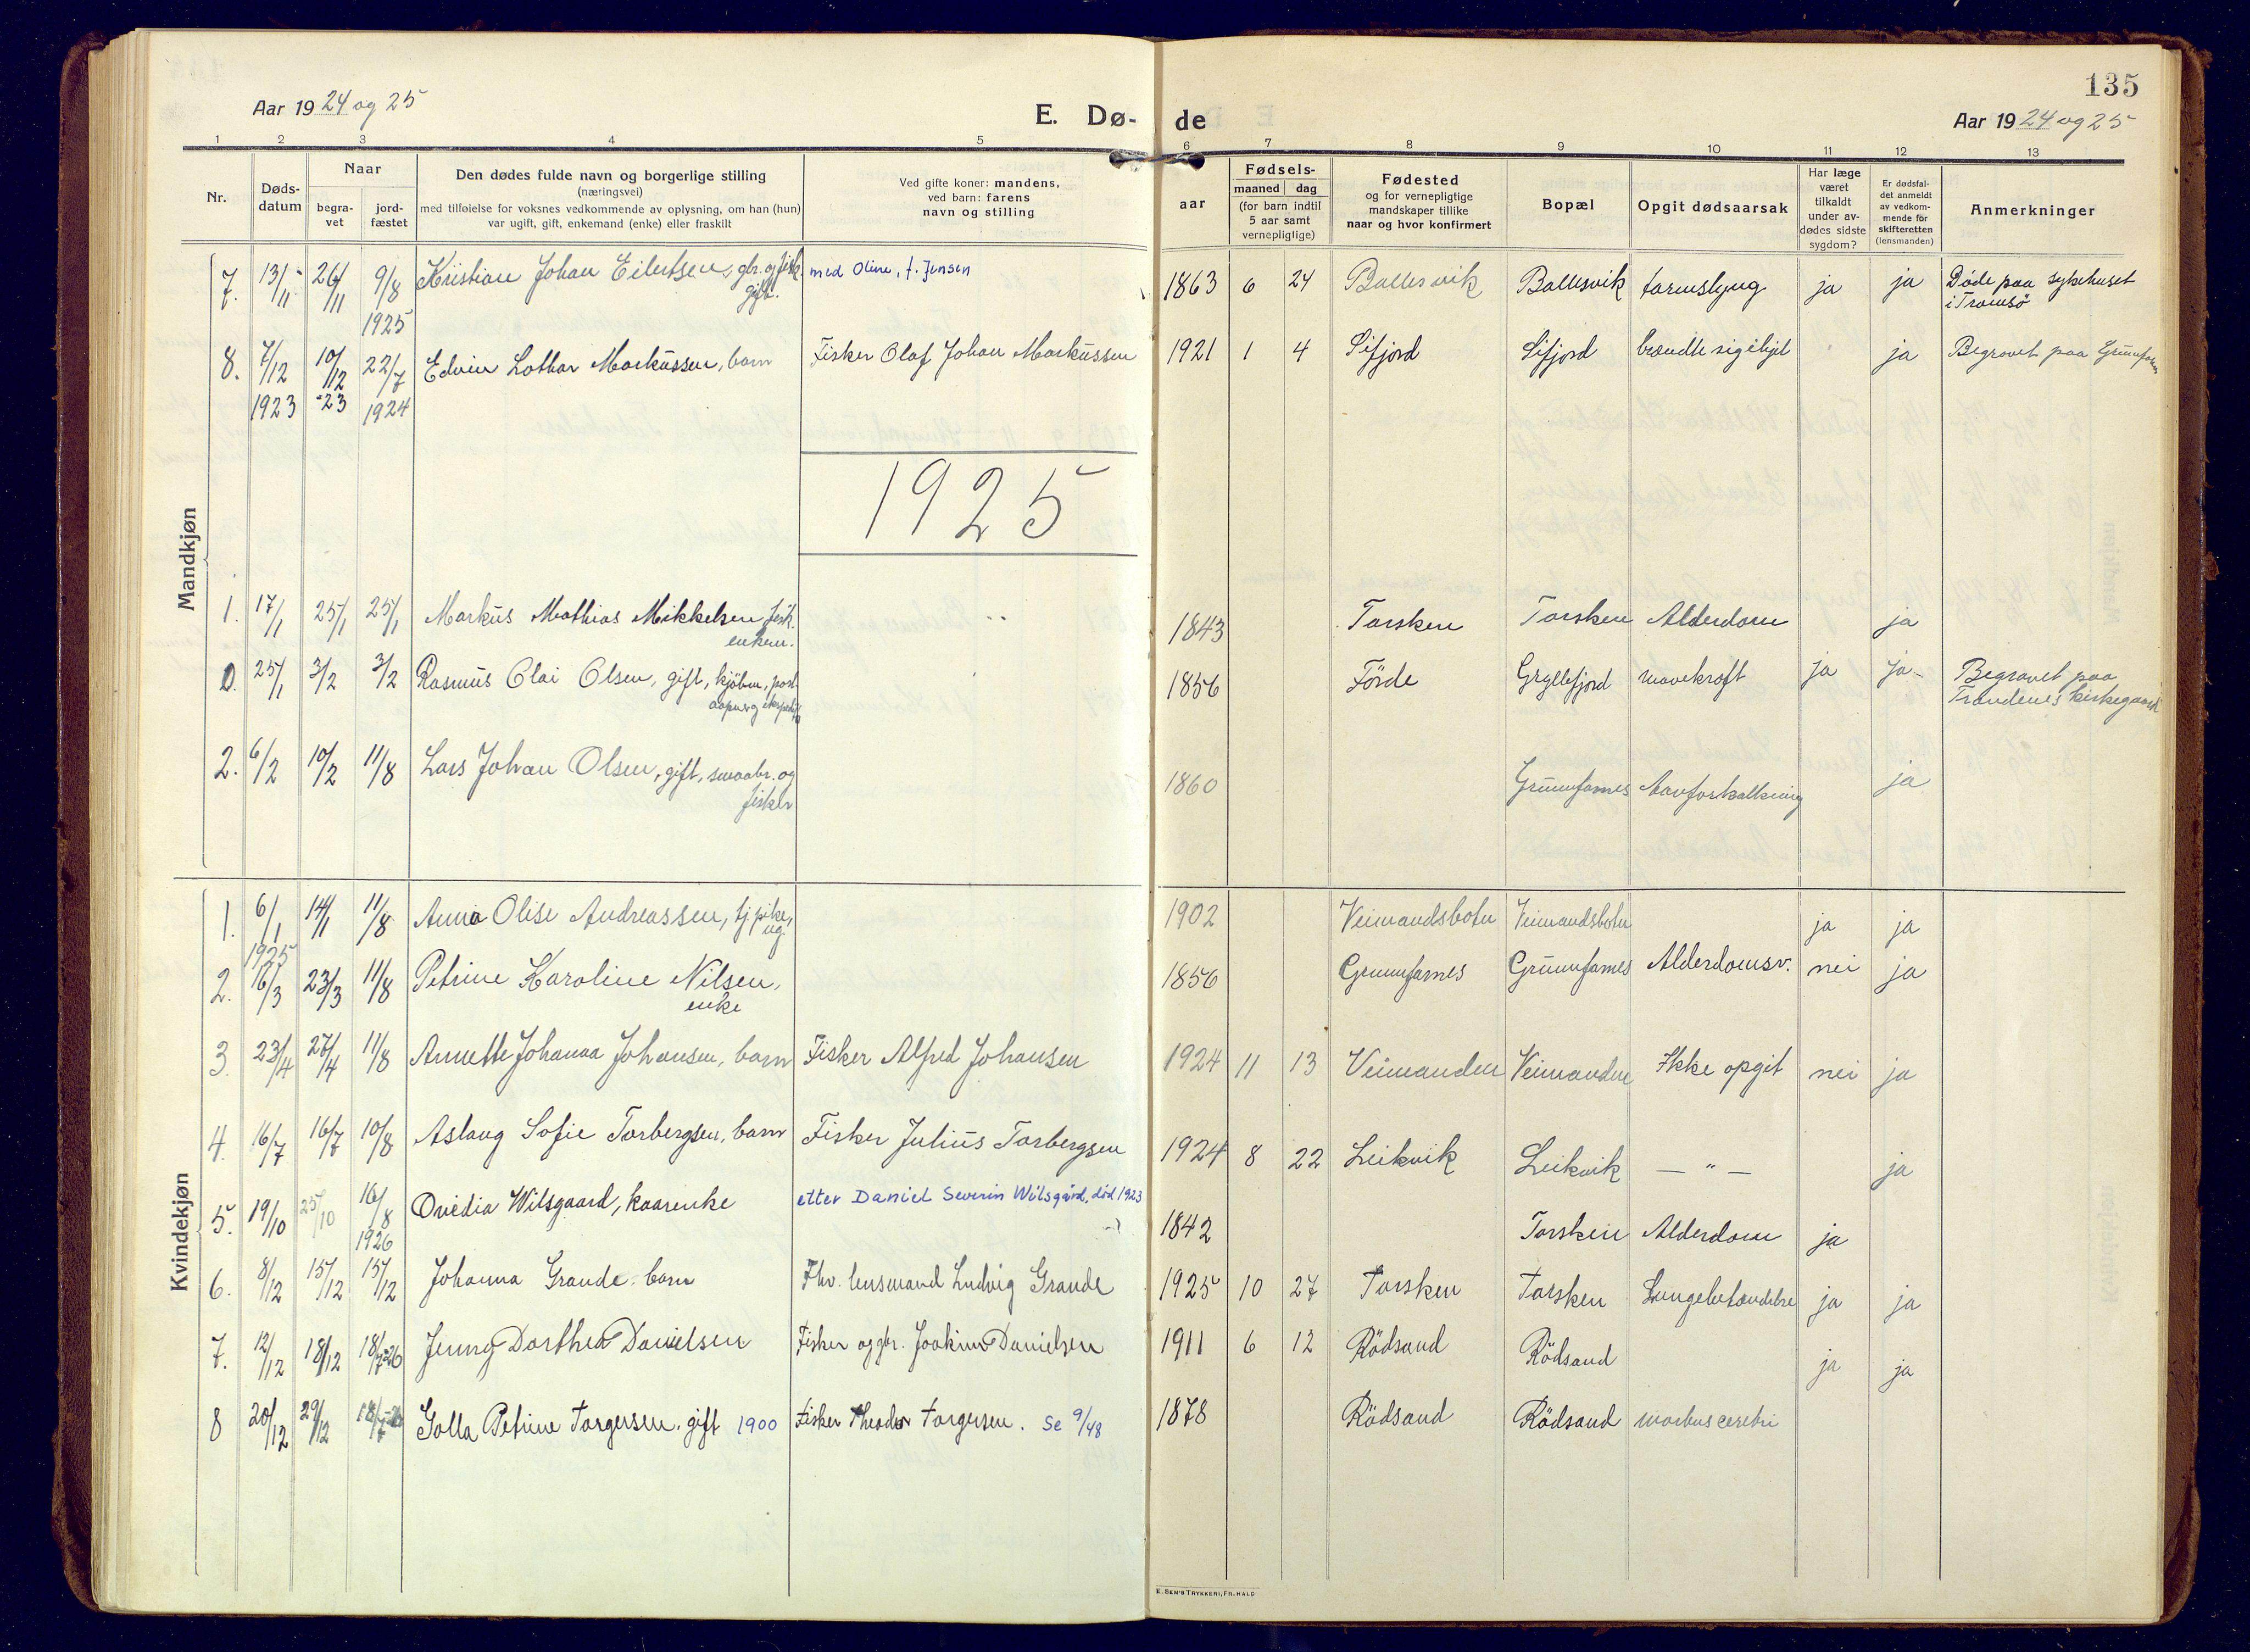 SATØ, Mefjord/Berg sokneprestkontor, G/Ga/Gaa: Ministerialbok nr. 10, 1916-1928, s. 135